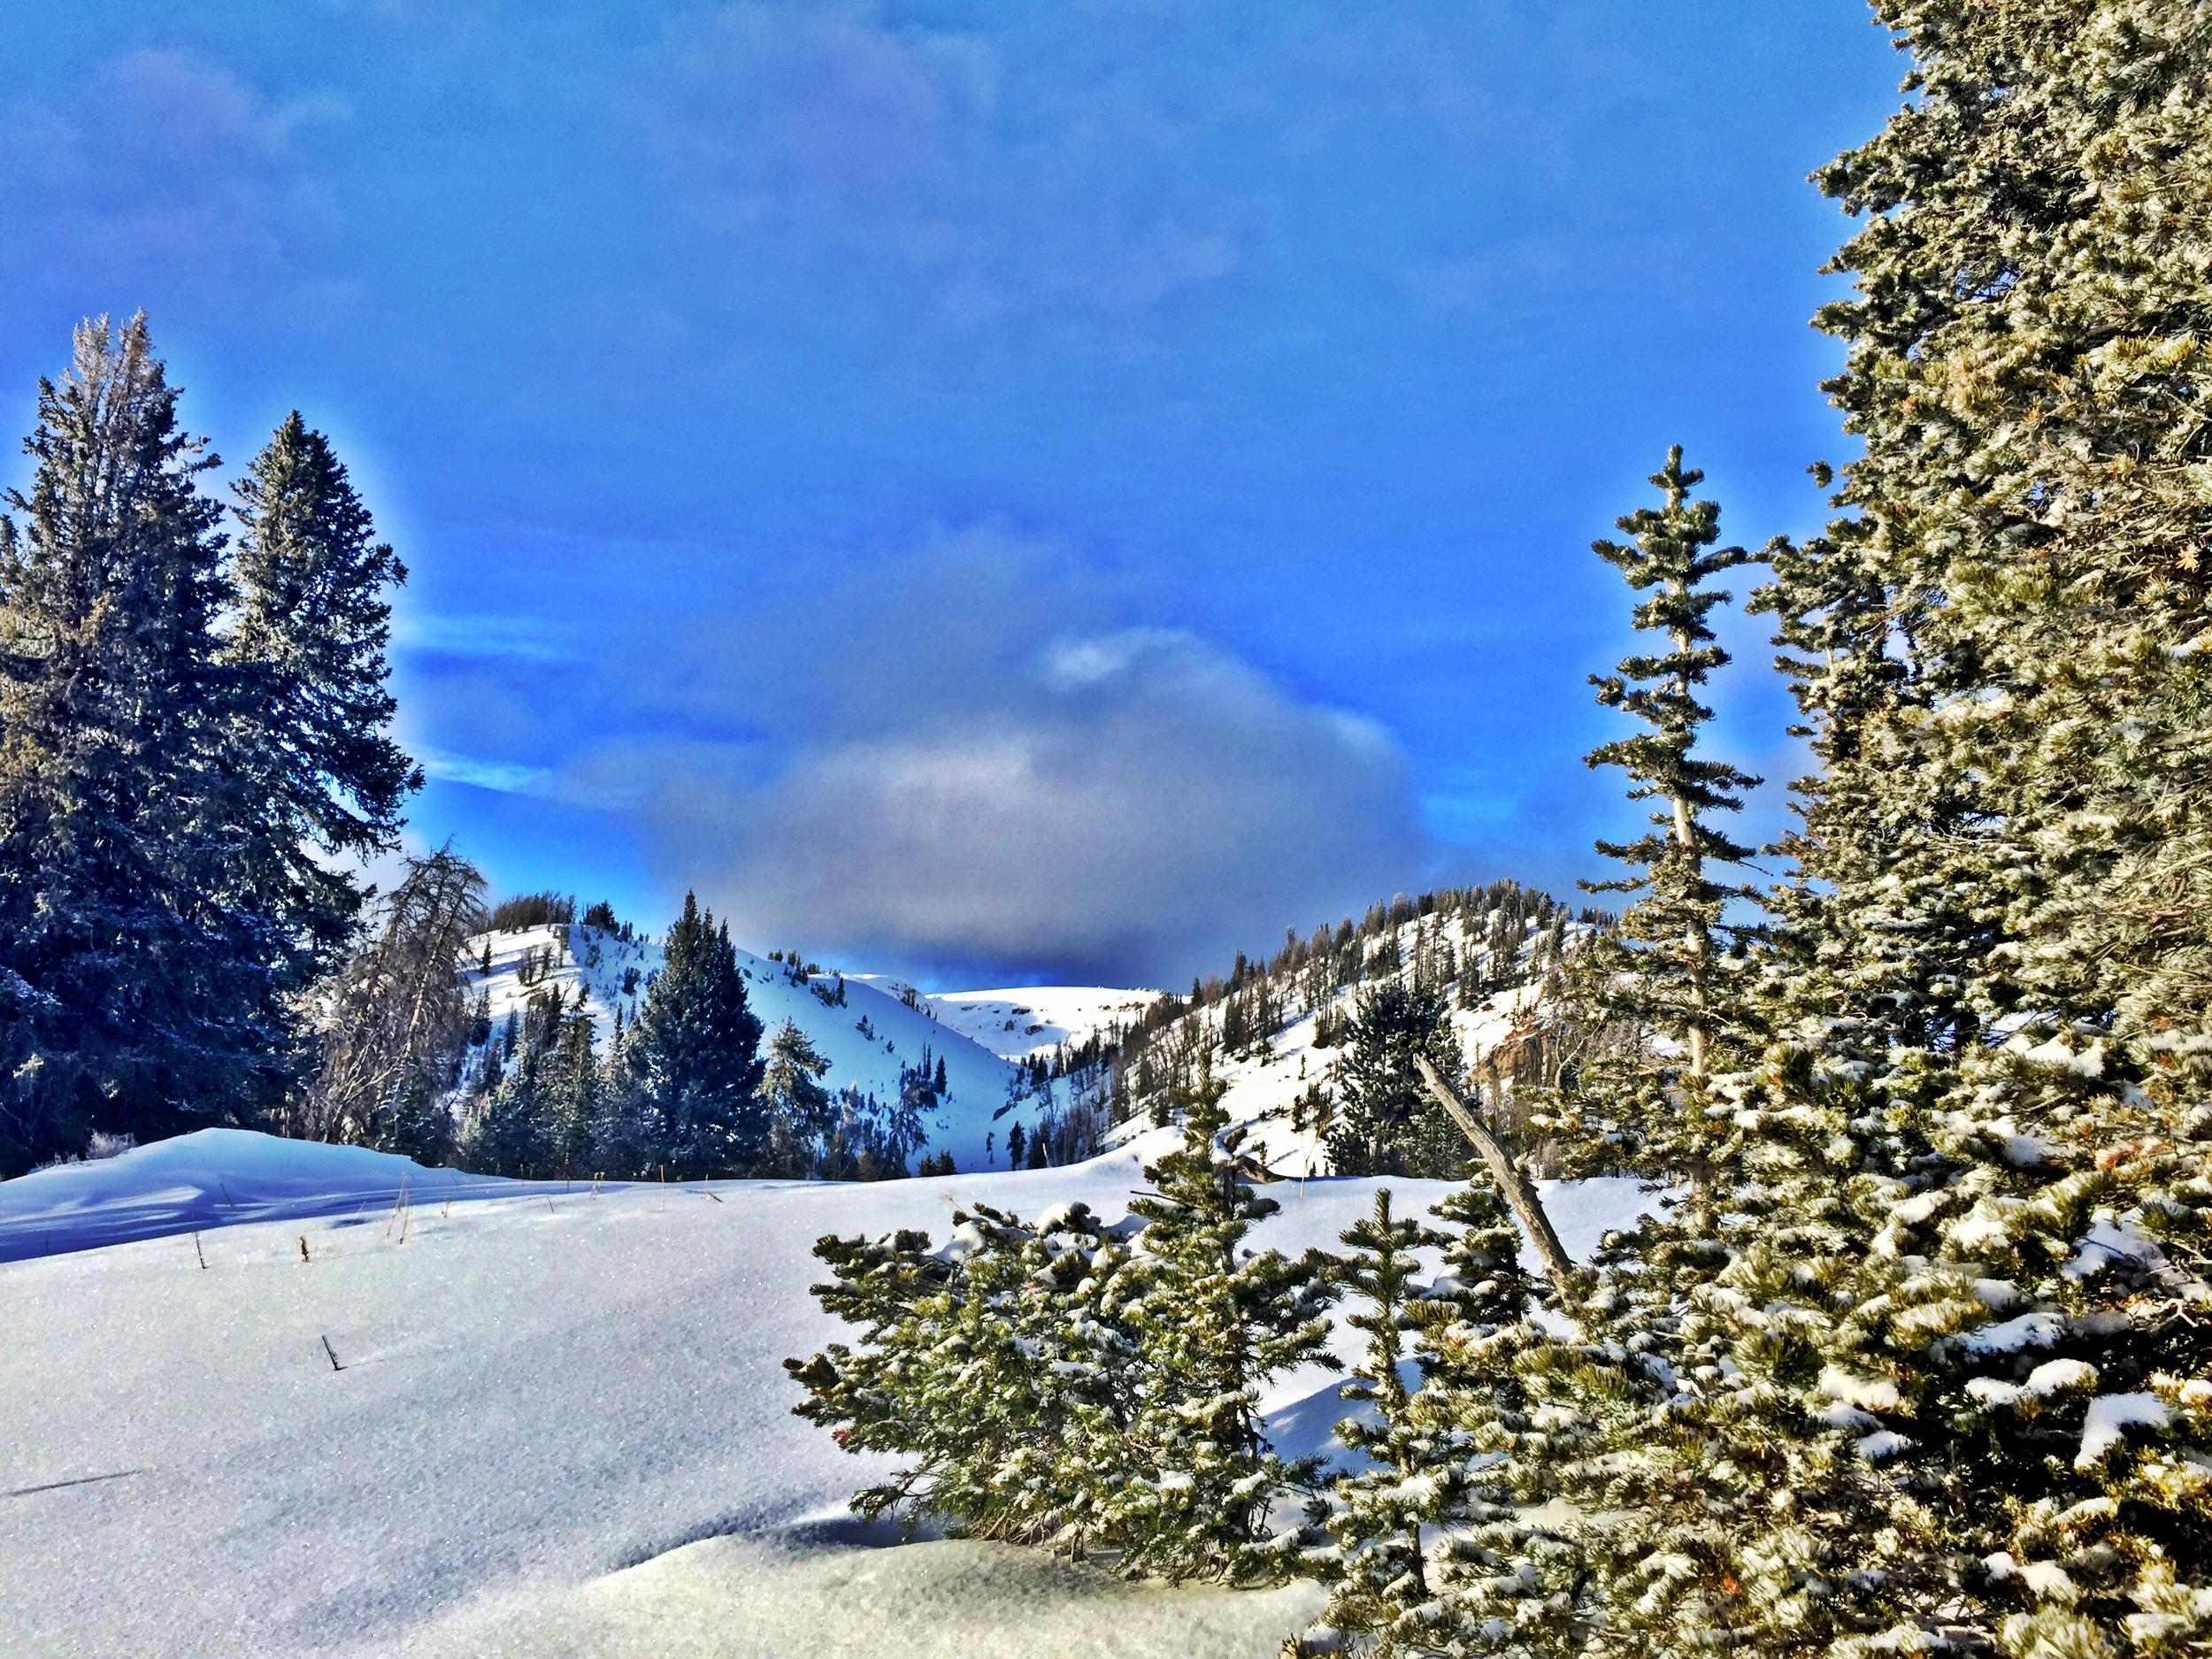 Grungy Slopes, Moran Wyoming, Togwotee Mountain Lodge 25.jpg